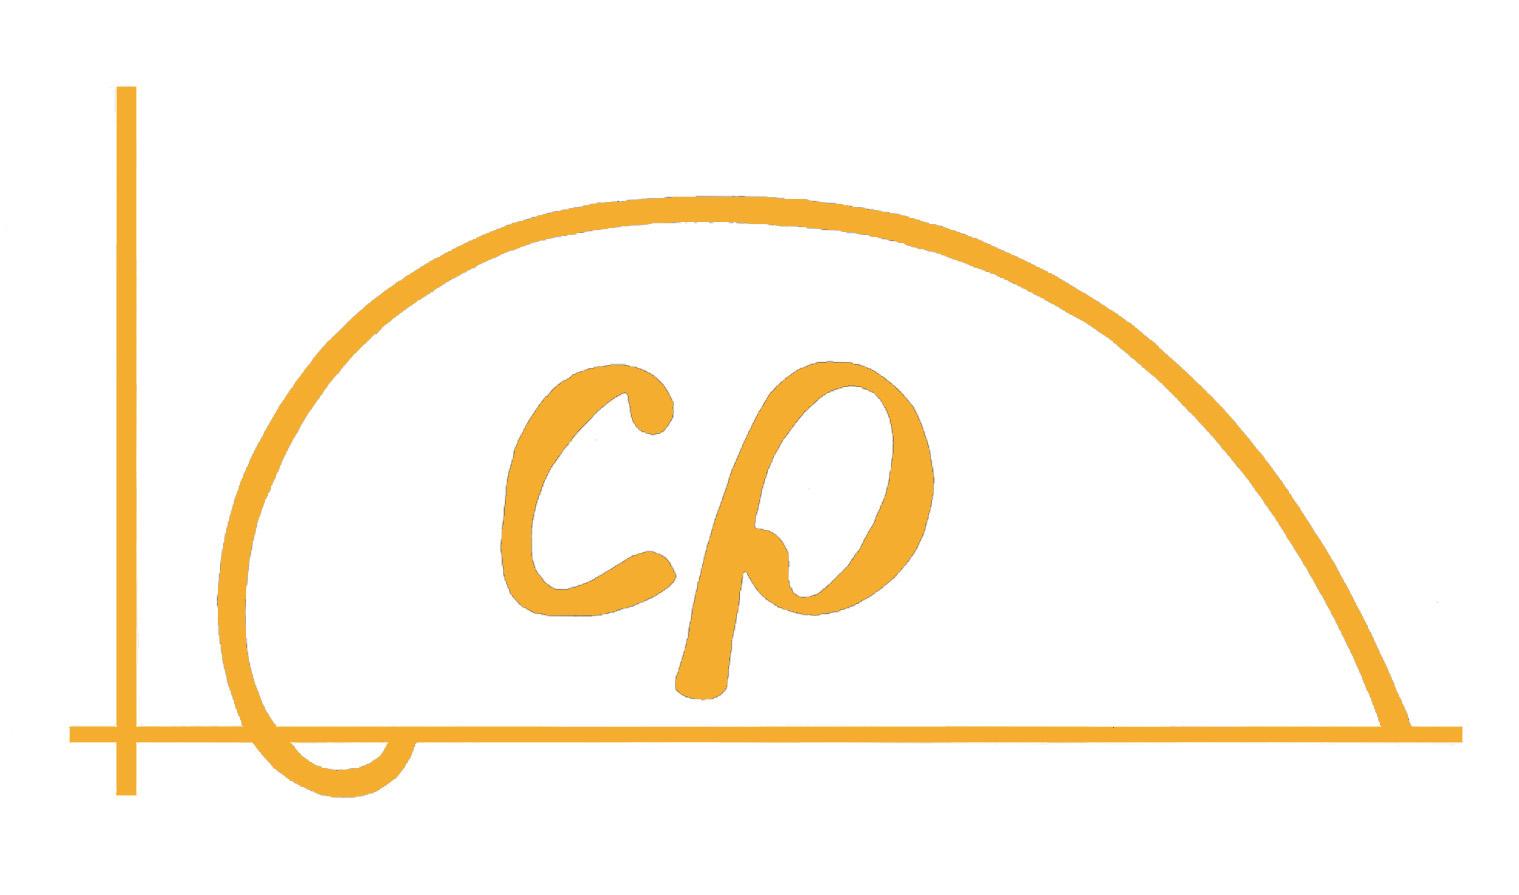 http://zonge.com/wp-content/uploads/2015/02/Zonge-Logo-CP_Gold.jpg